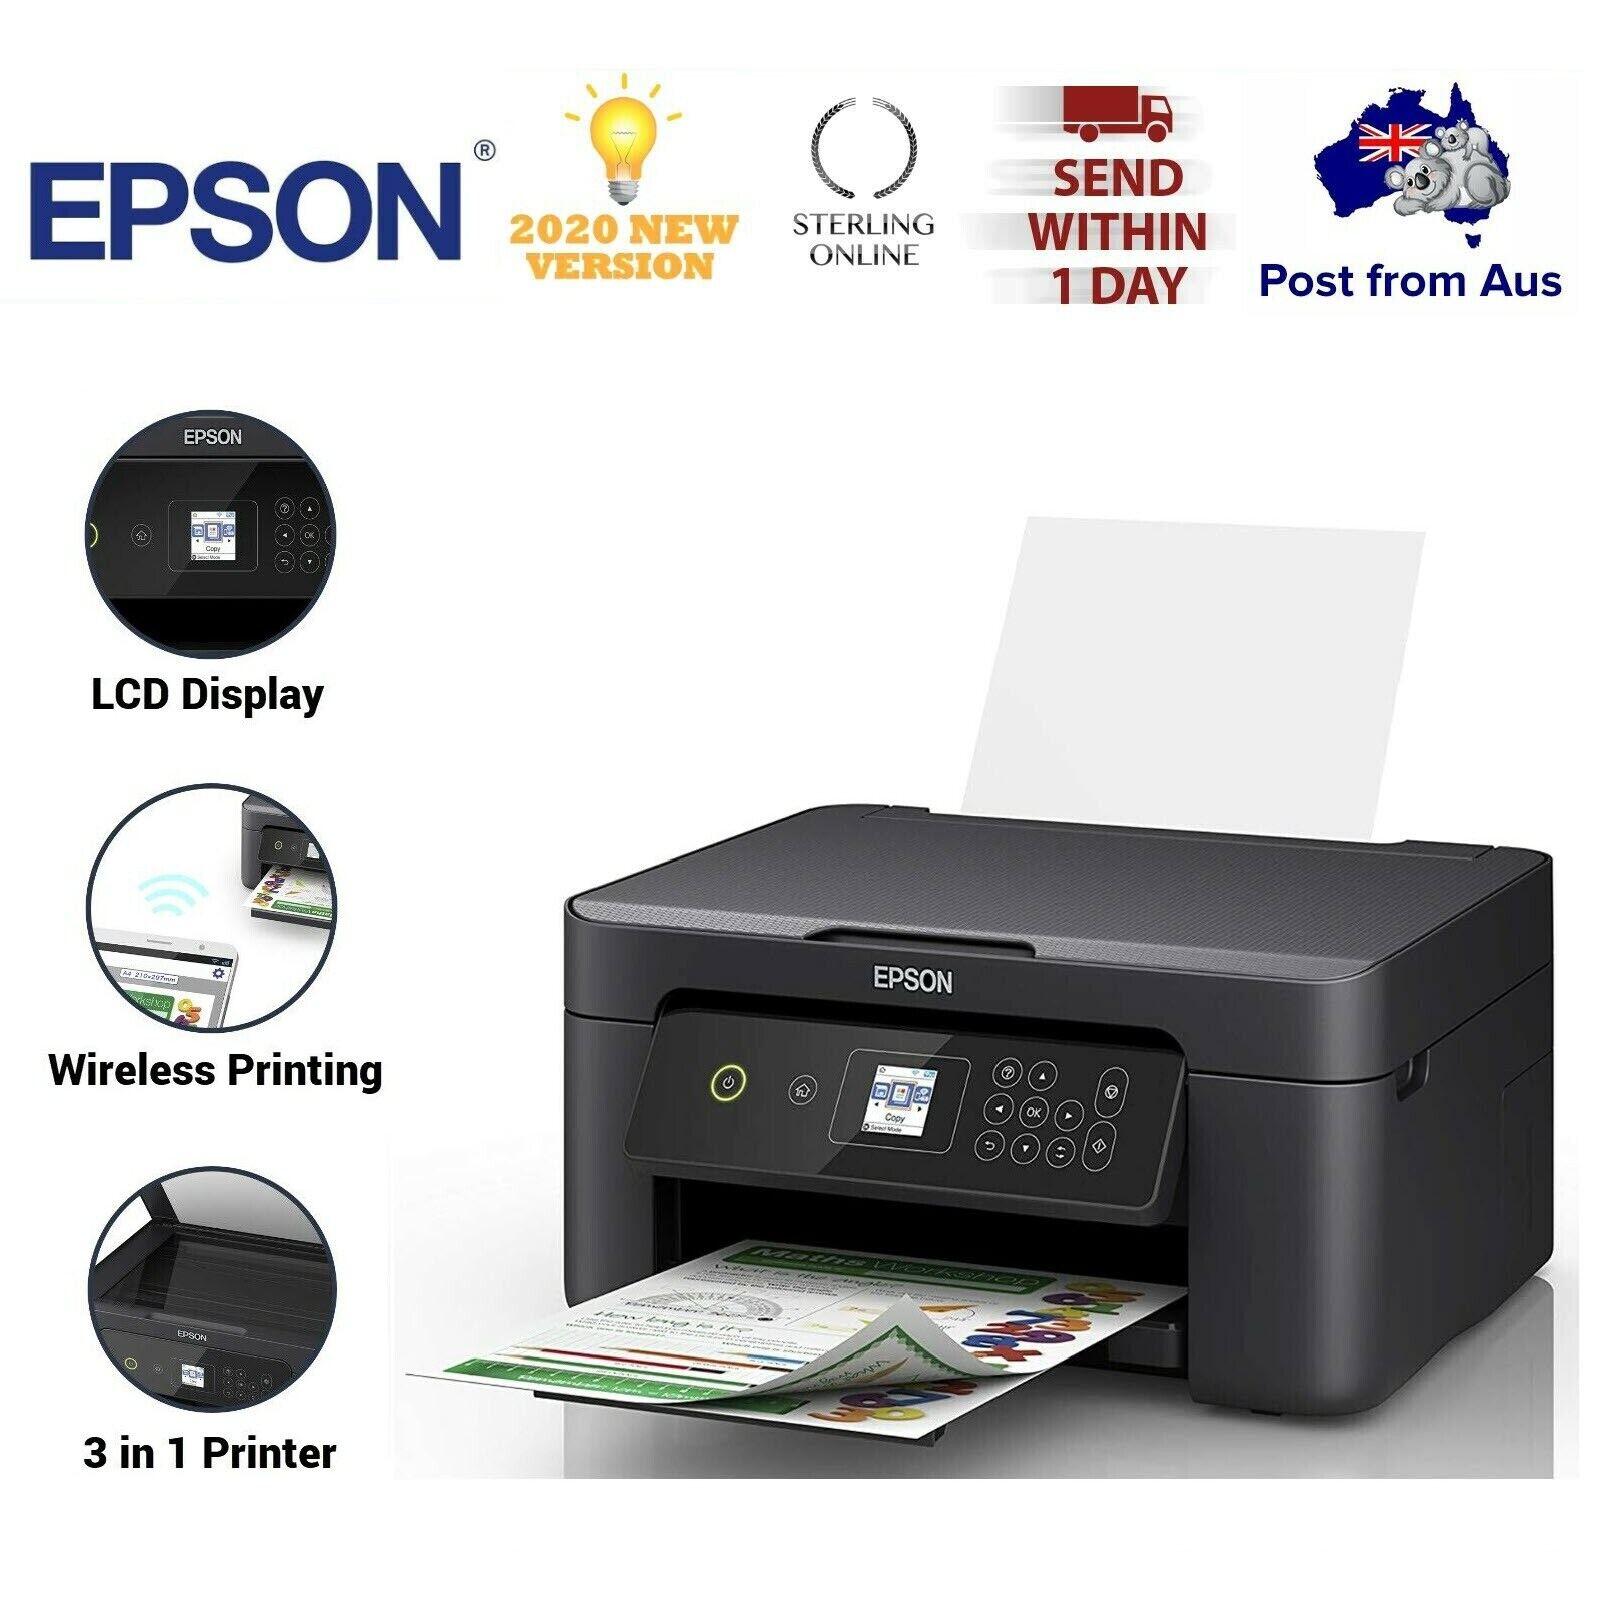 Epson Expression Home Xp 3100 Print Copy Scan Cordless Multi Use Printer 9314020629723 Ebay